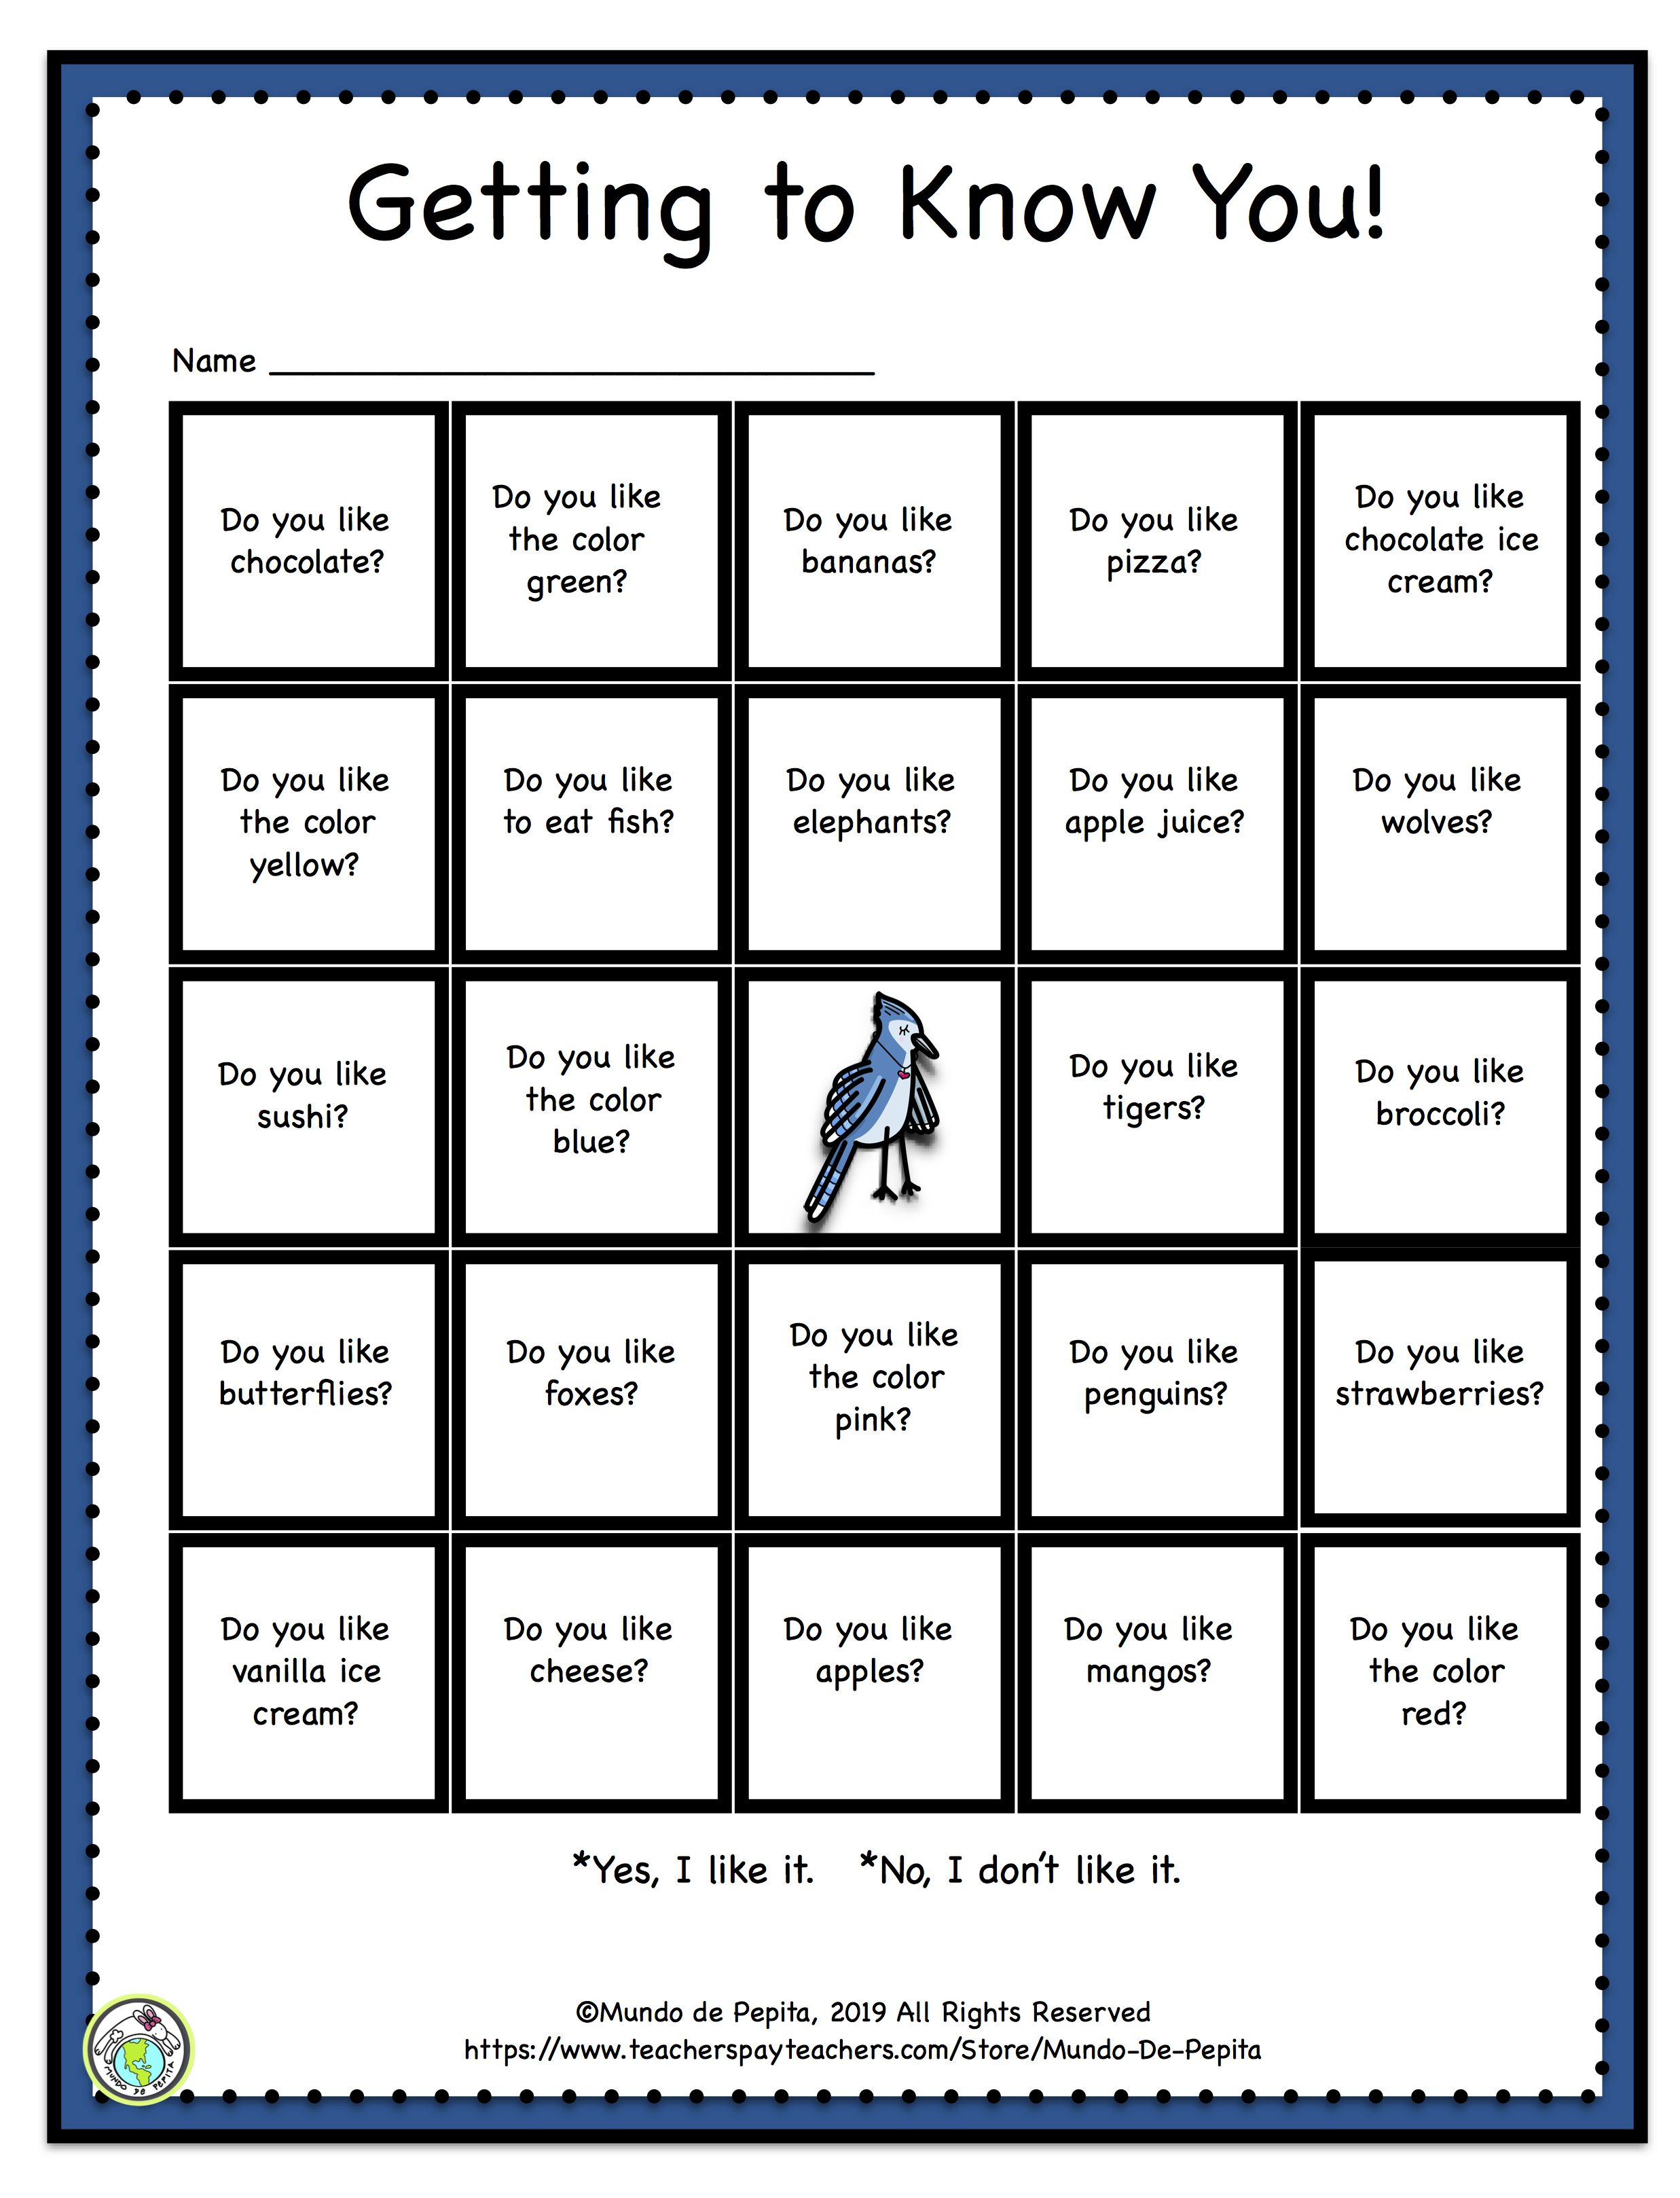 Getting To Know You Bingo Game In English